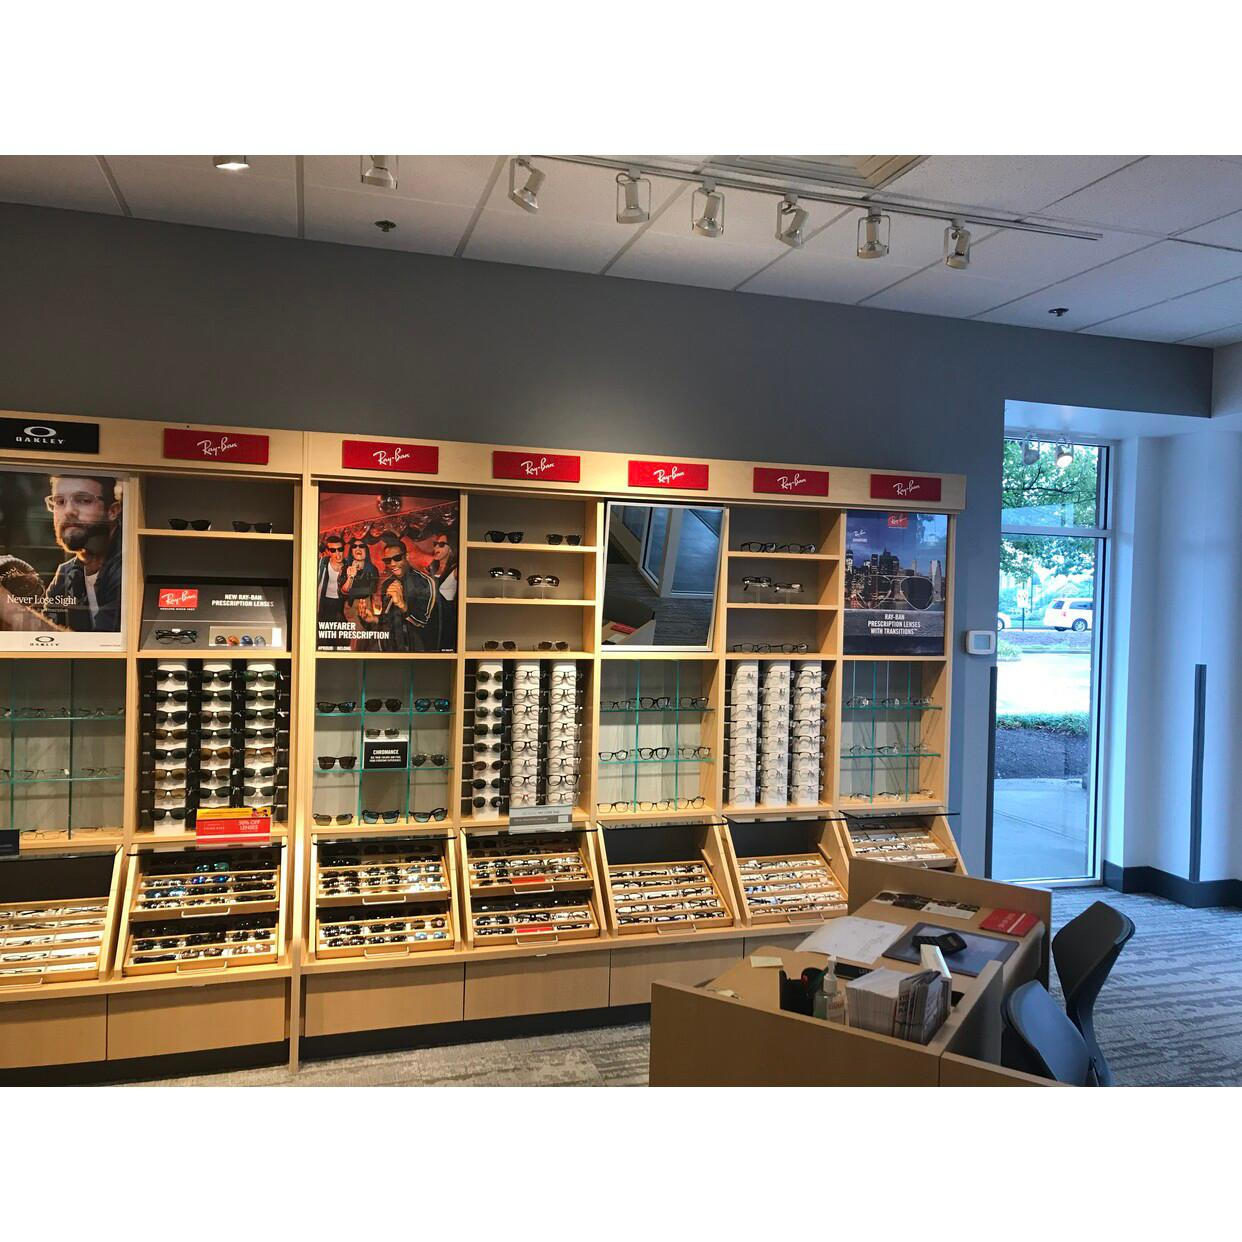 Lenscrafters 2160 Sir Barton Way Ste 143 Hamburg Pavillion Lexington Ky Optical Goods Retail Mapquest